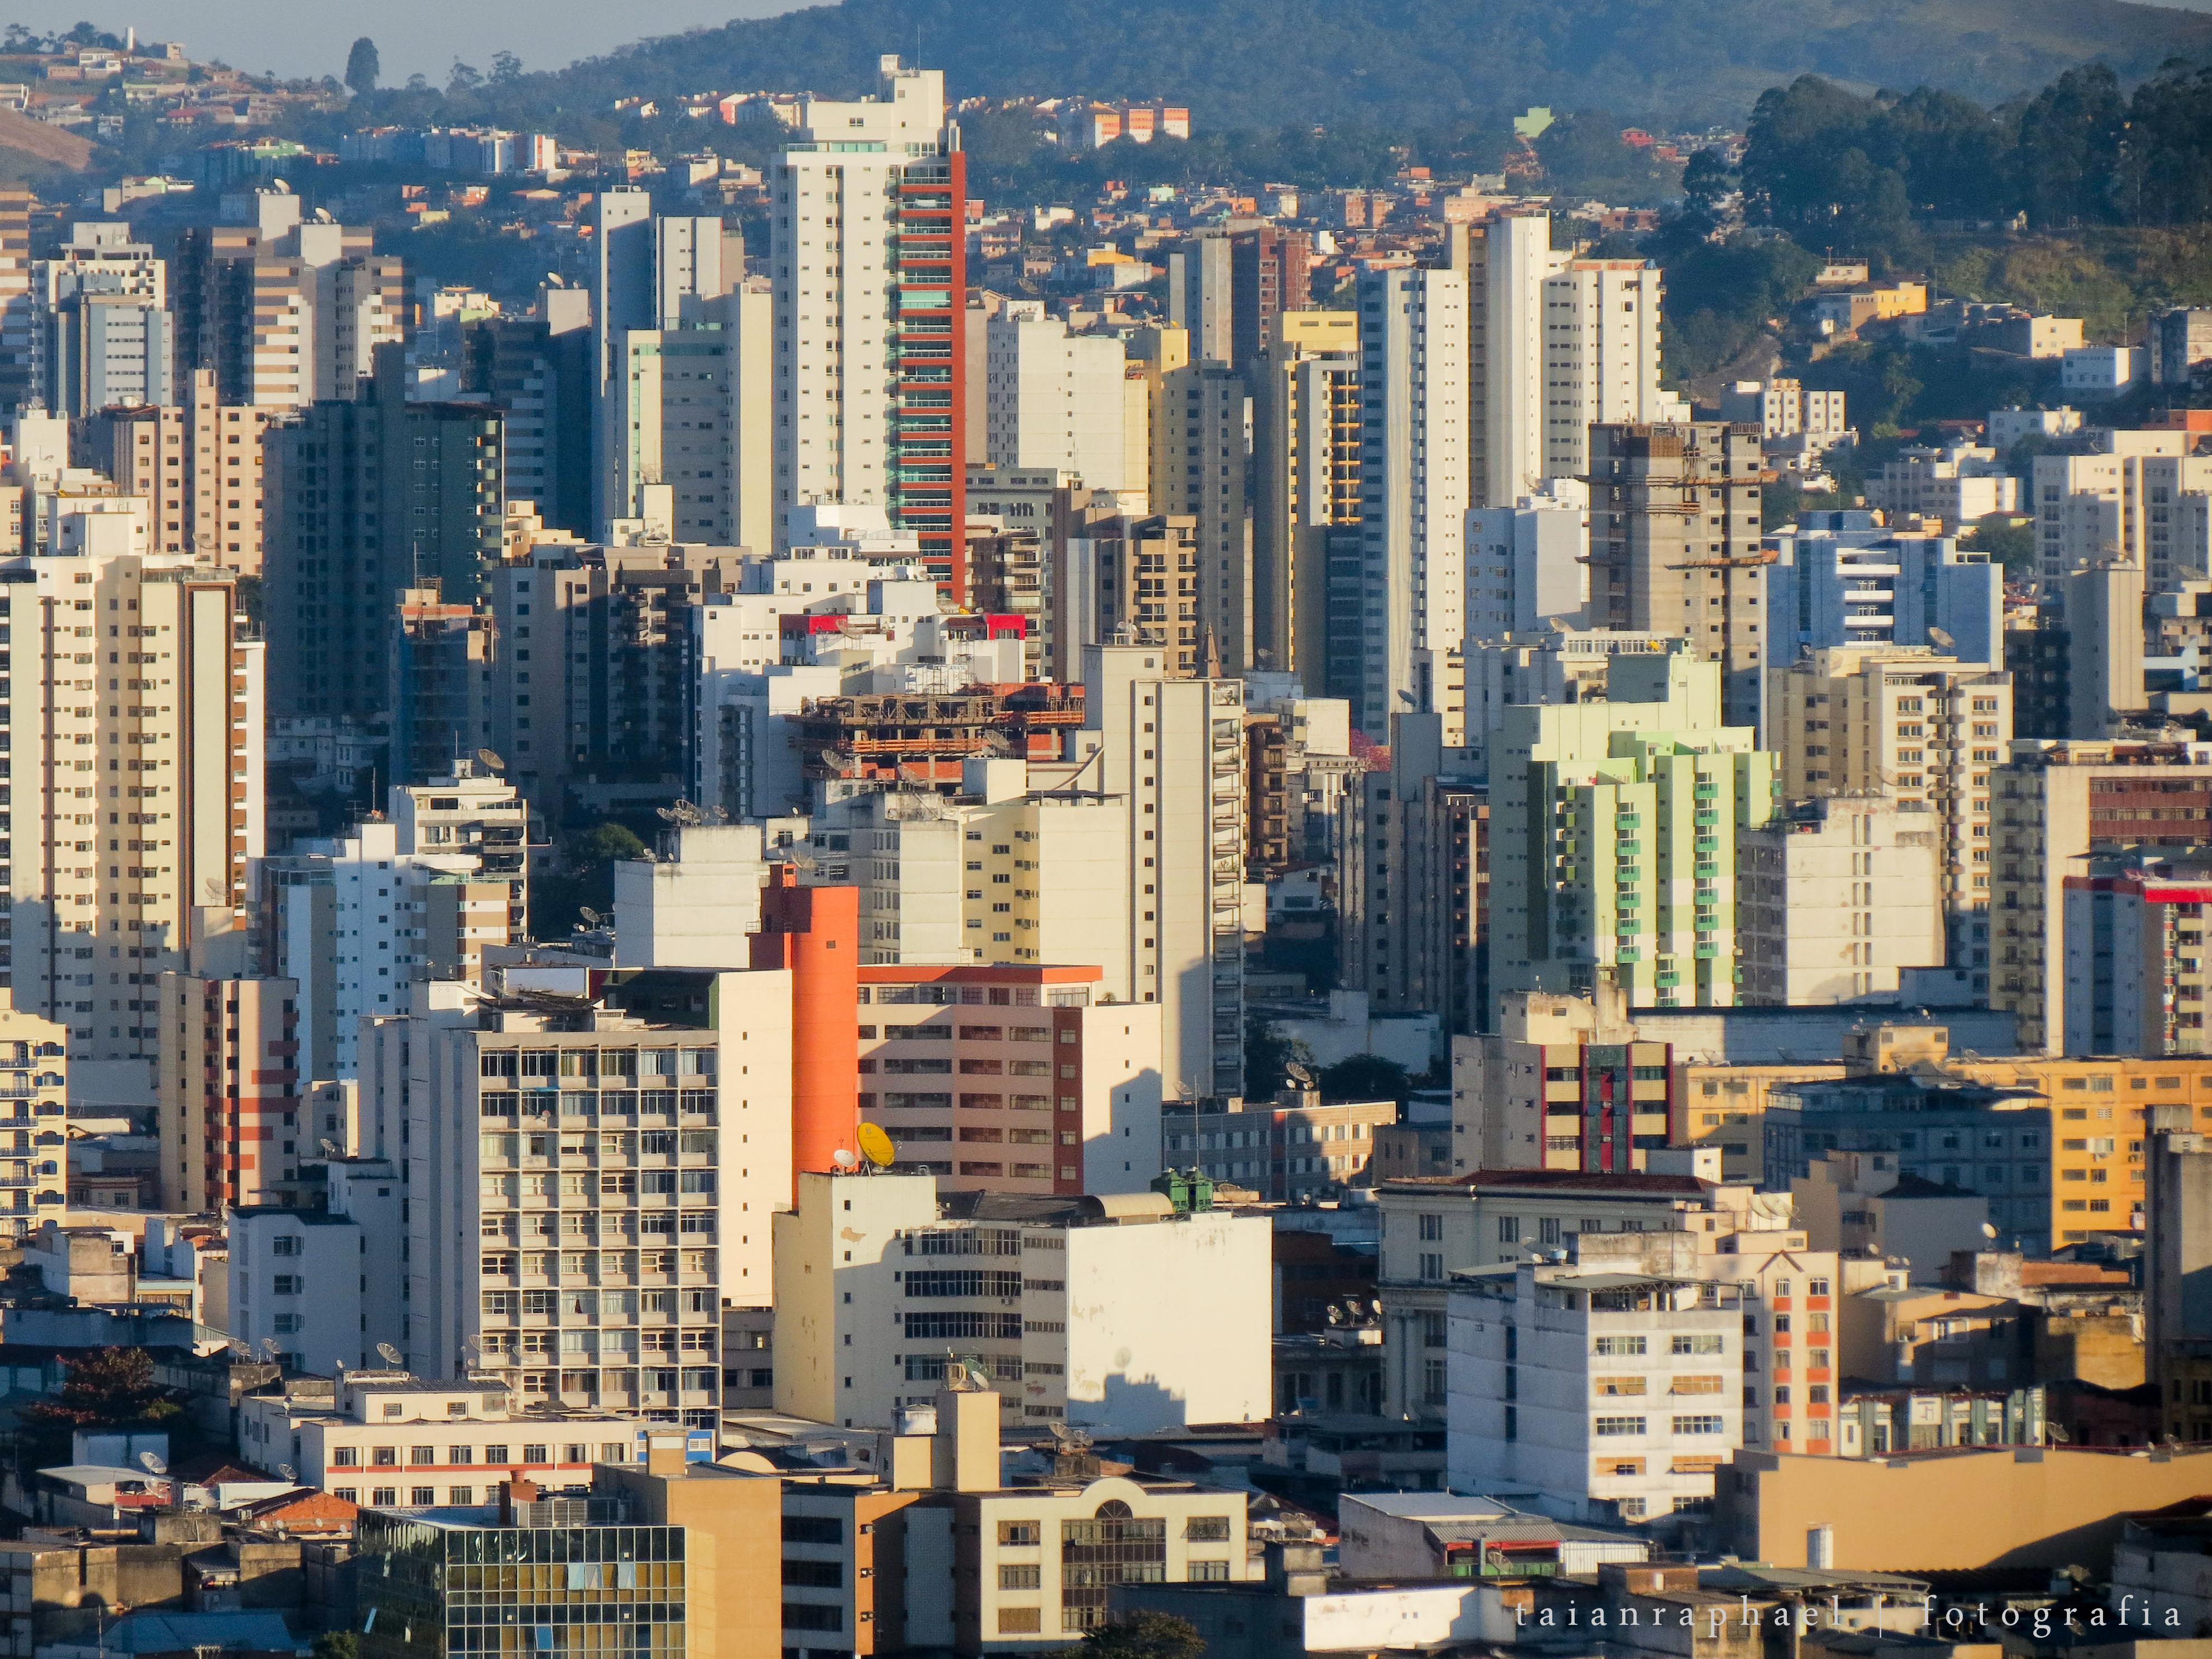 #A45D27 05 panoramica skyline centro de juiz de fora image hosted on flickr 1640 Janela De Aluminio Juiz De Fora